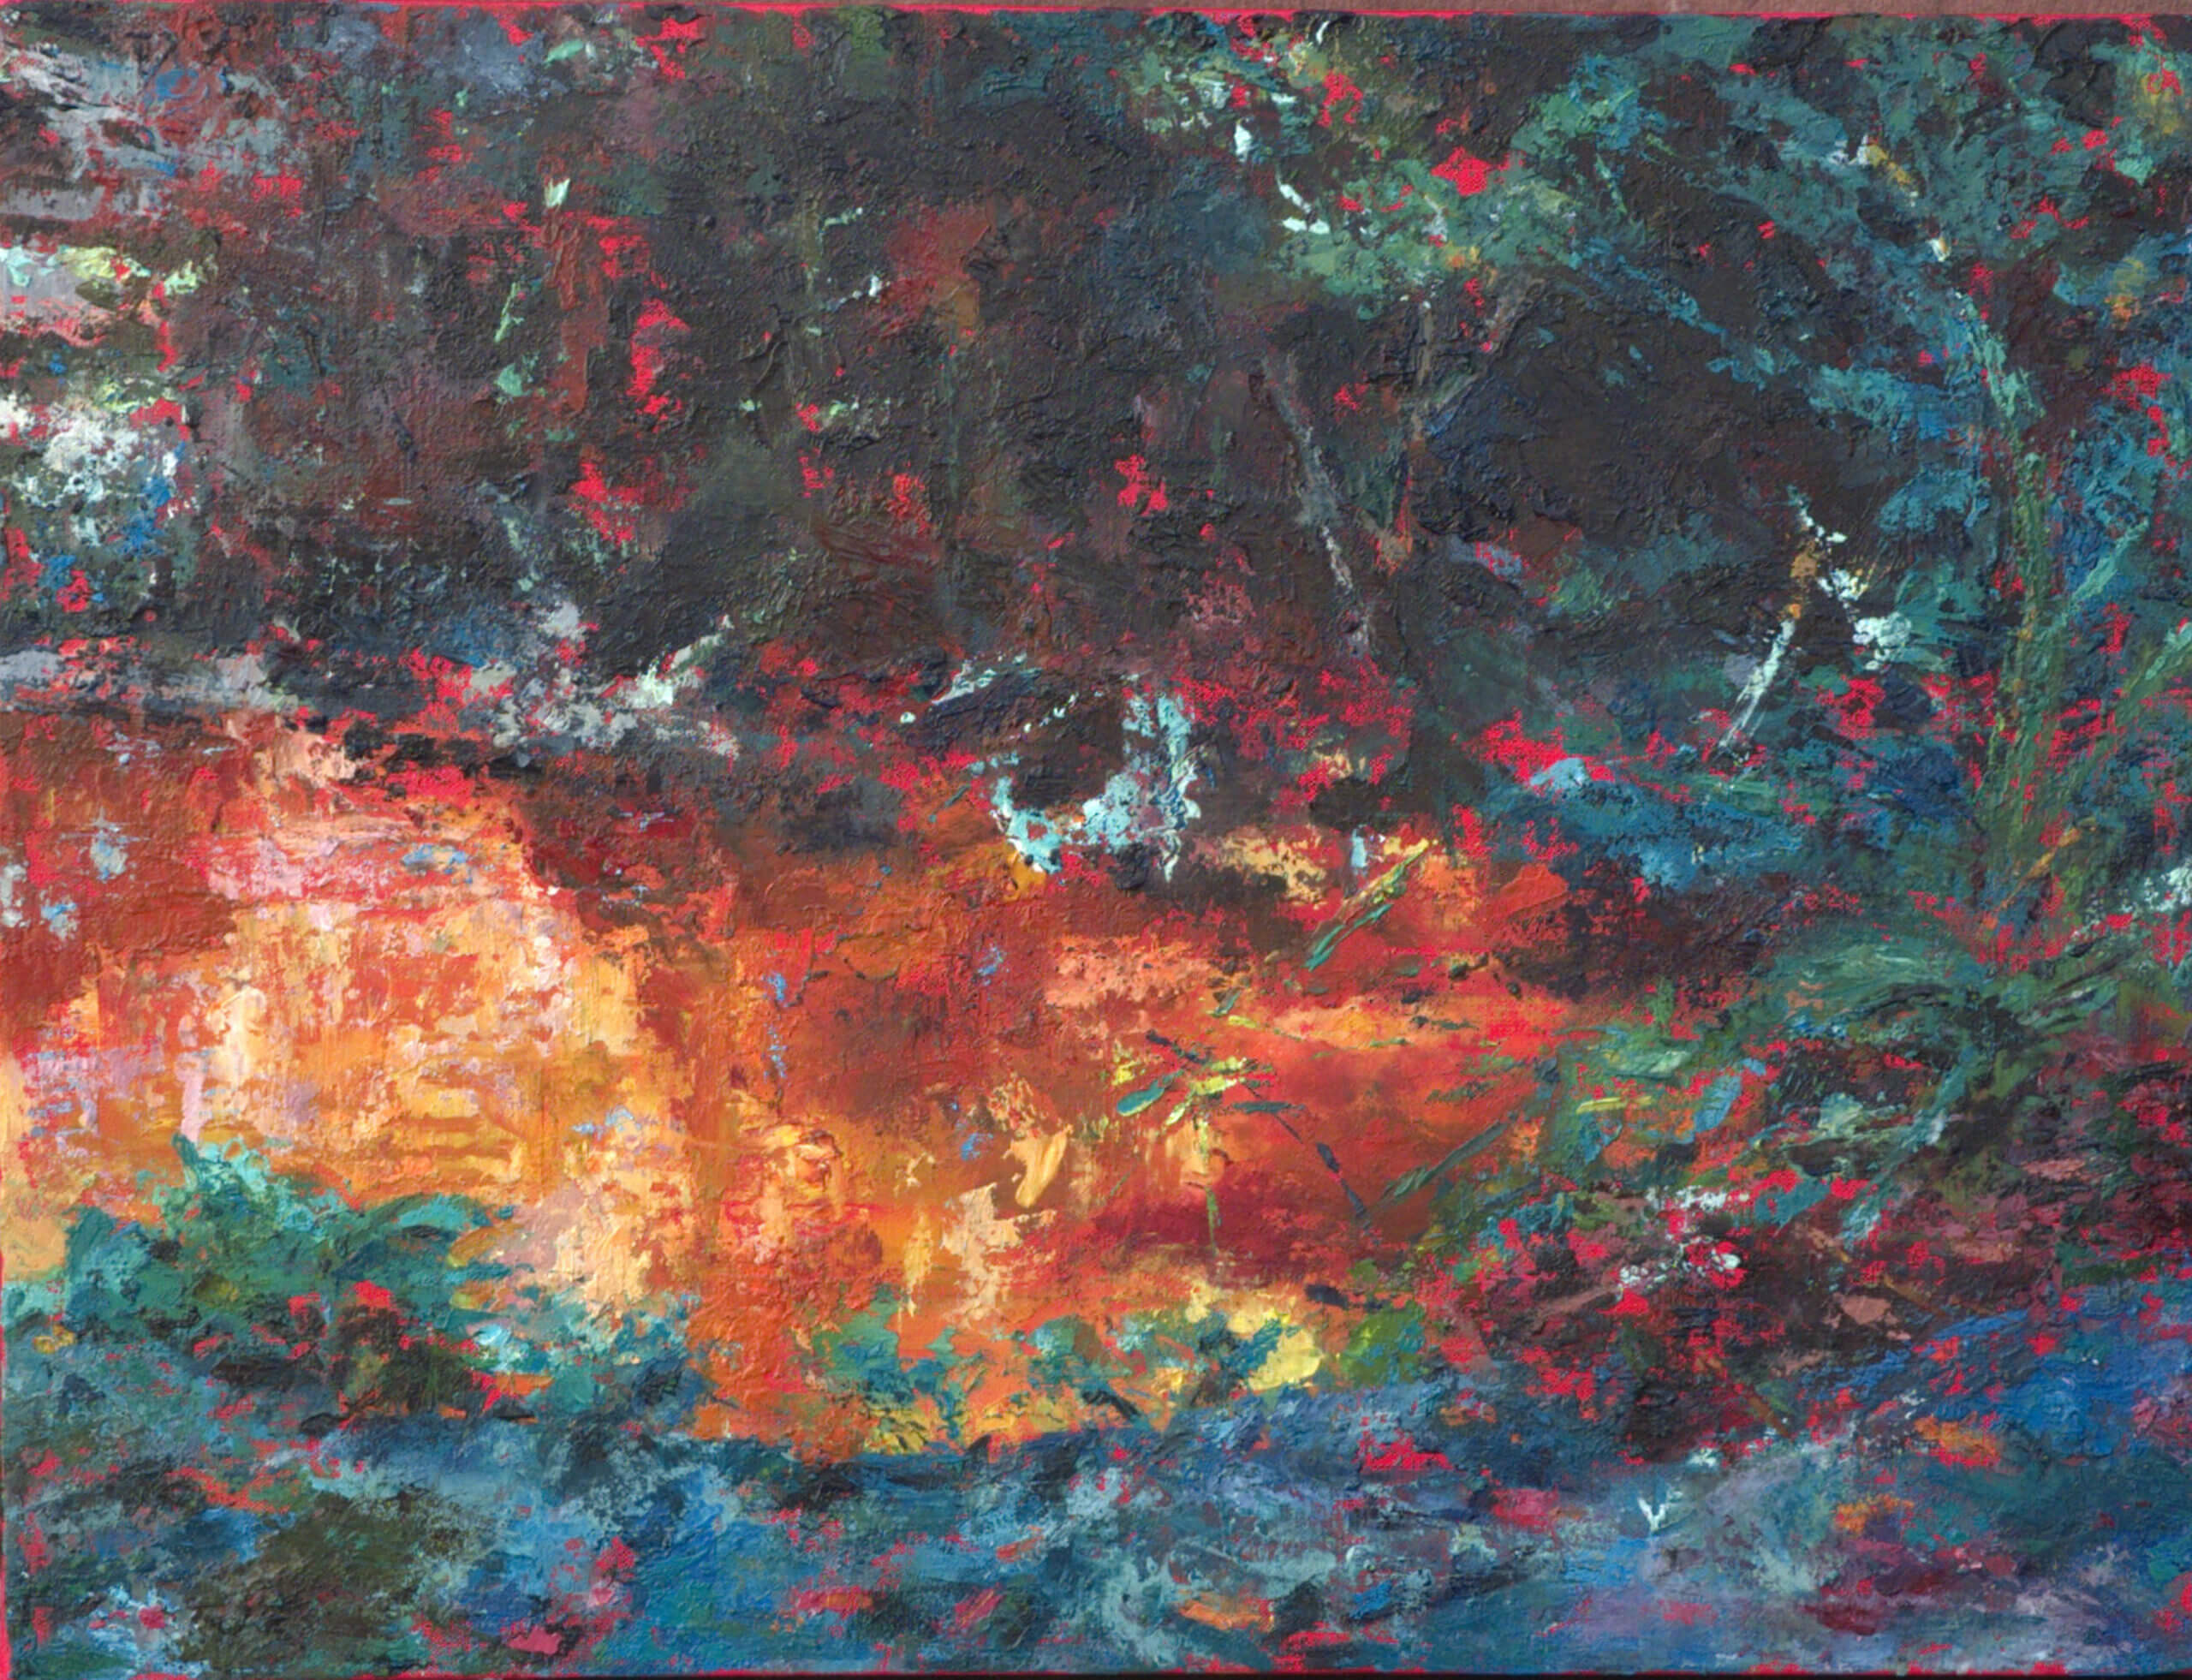 'Baku Orange Pool', oil on canvas, 2014, 60 x 46cm